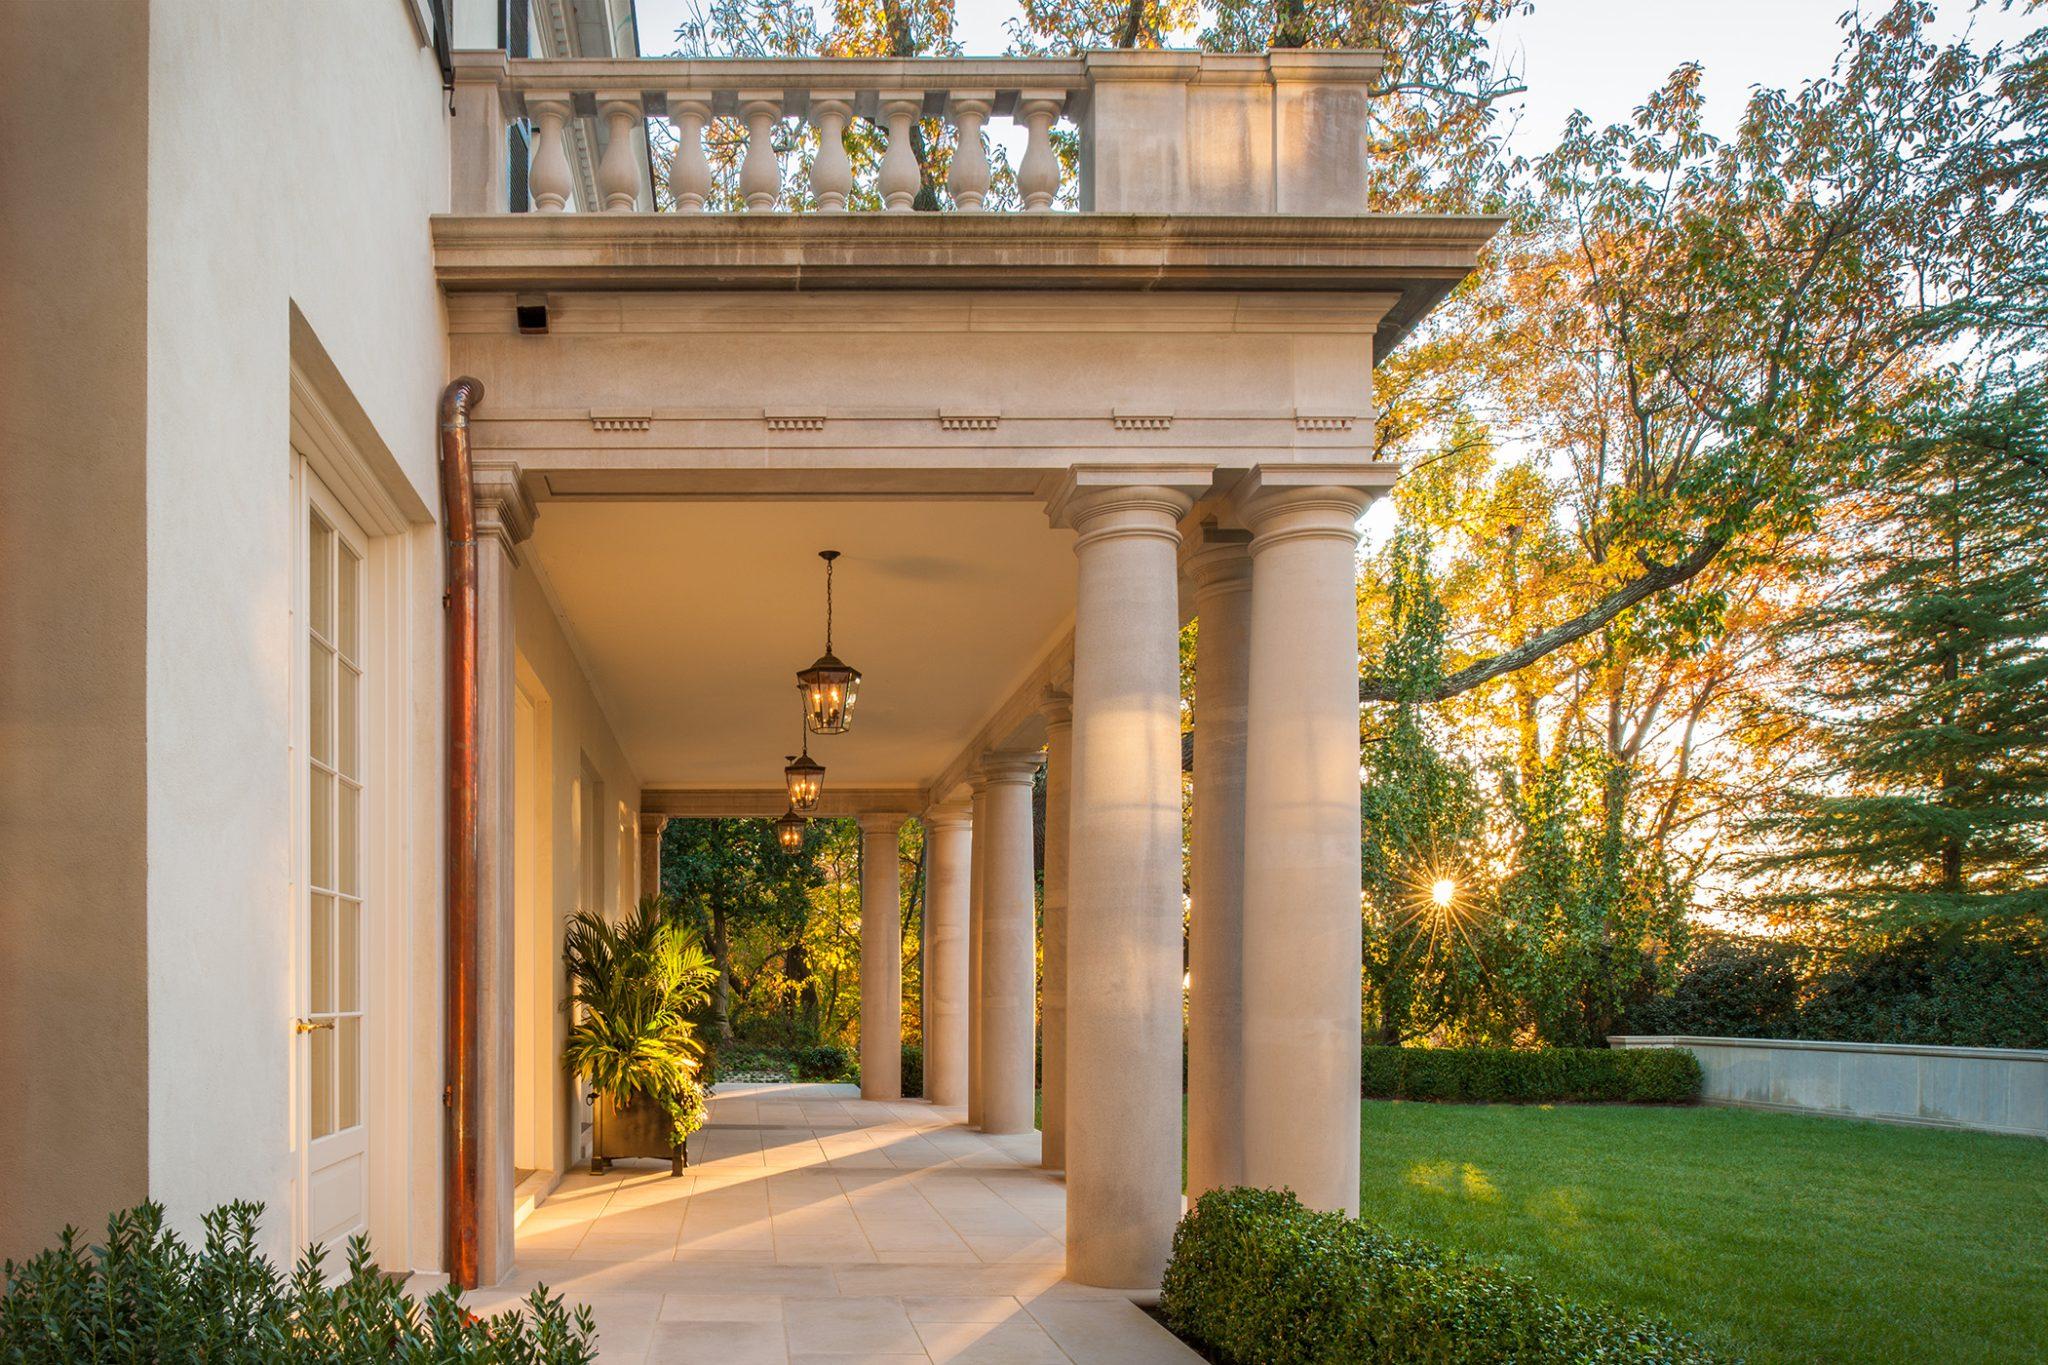 Regency style estate in Washington DC with limestone portico by Jones & Boer Architects, Inc.